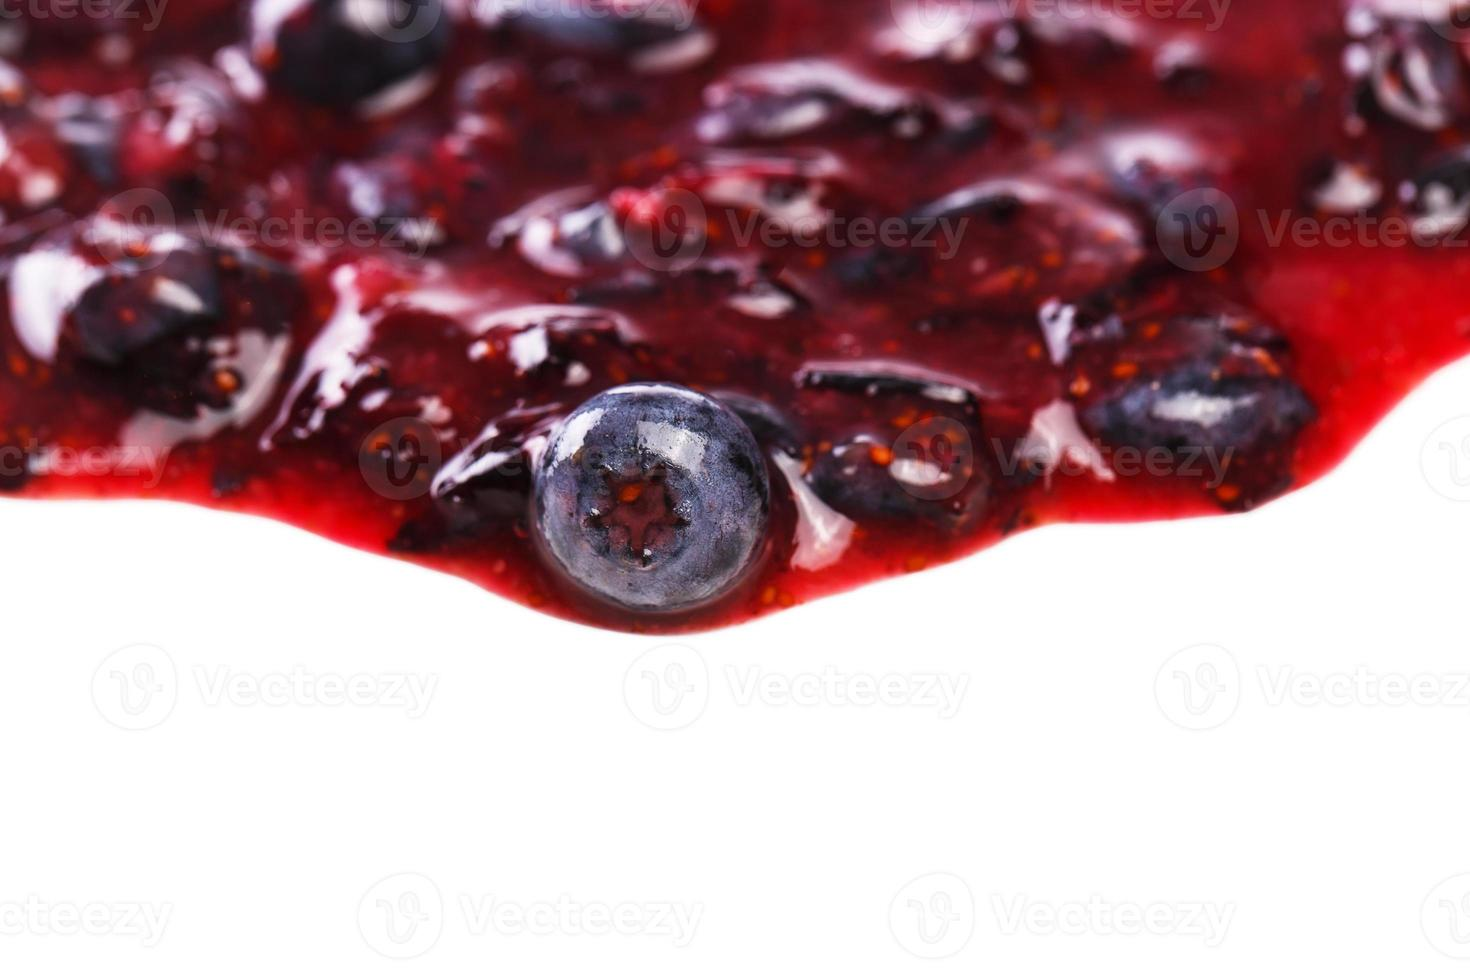 Delicious, natural jam photo